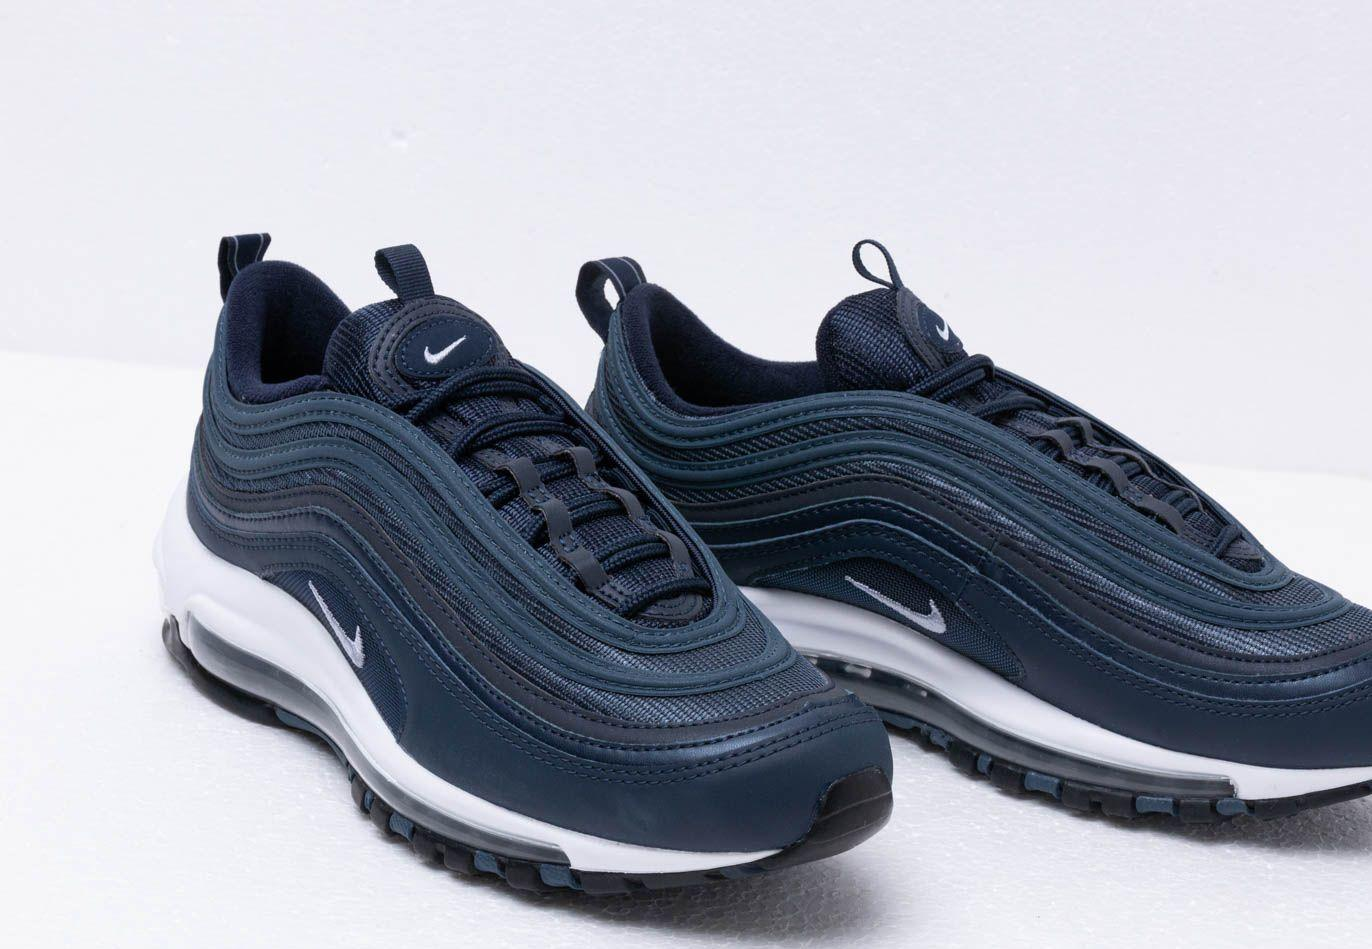 c76f484aa9 Nike - Air Max 97 Essential Obsidian/ Obsidian Mist-monsoon Blue for Men -.  View fullscreen